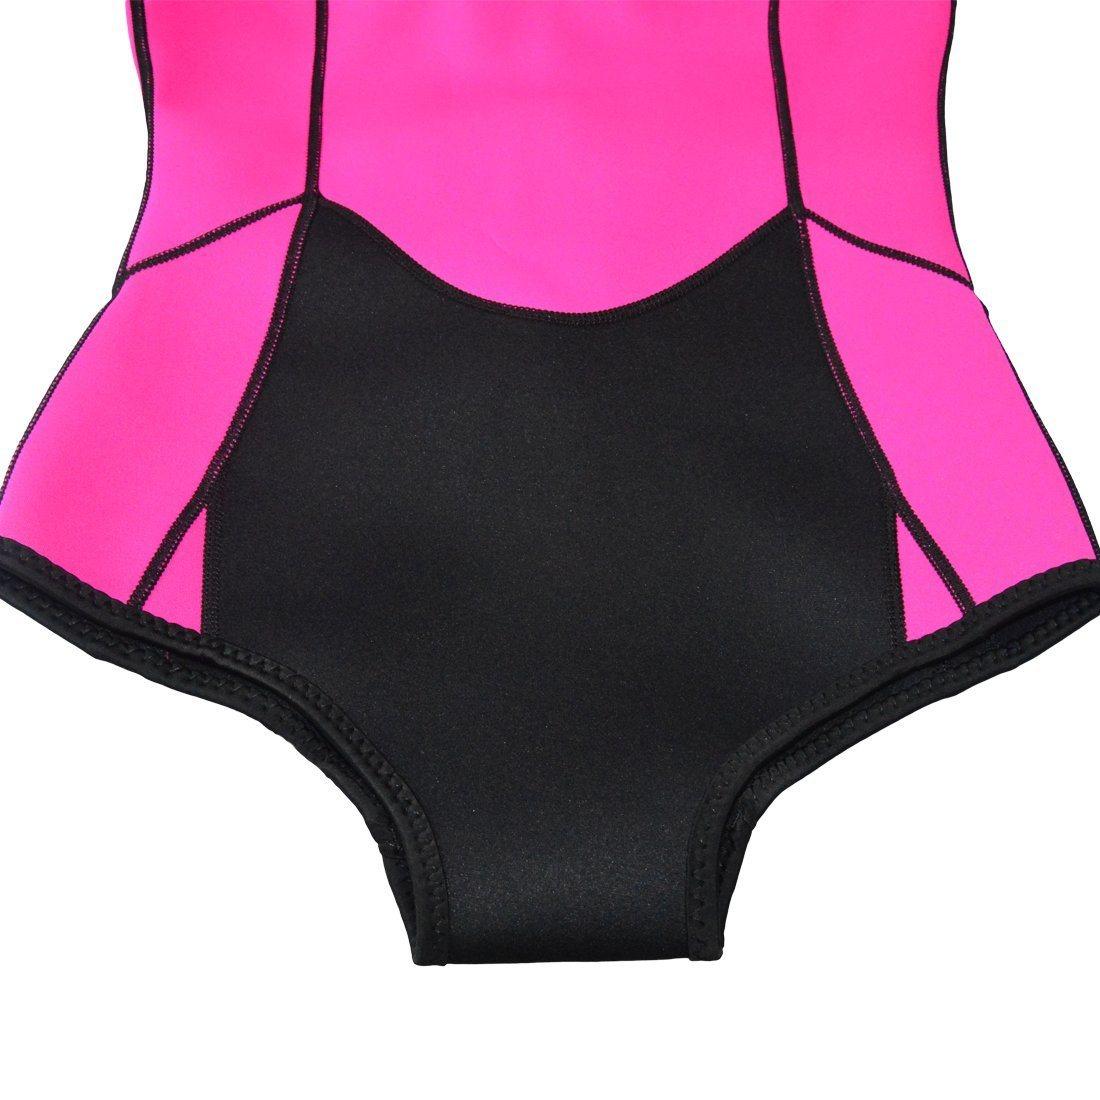 662e29f4785ae Wholesale Custom Made Private Label Neoprene Swimming Wetsuit Wetsuits Top  Premium Neoprene 3mm Zipper Diving Vest